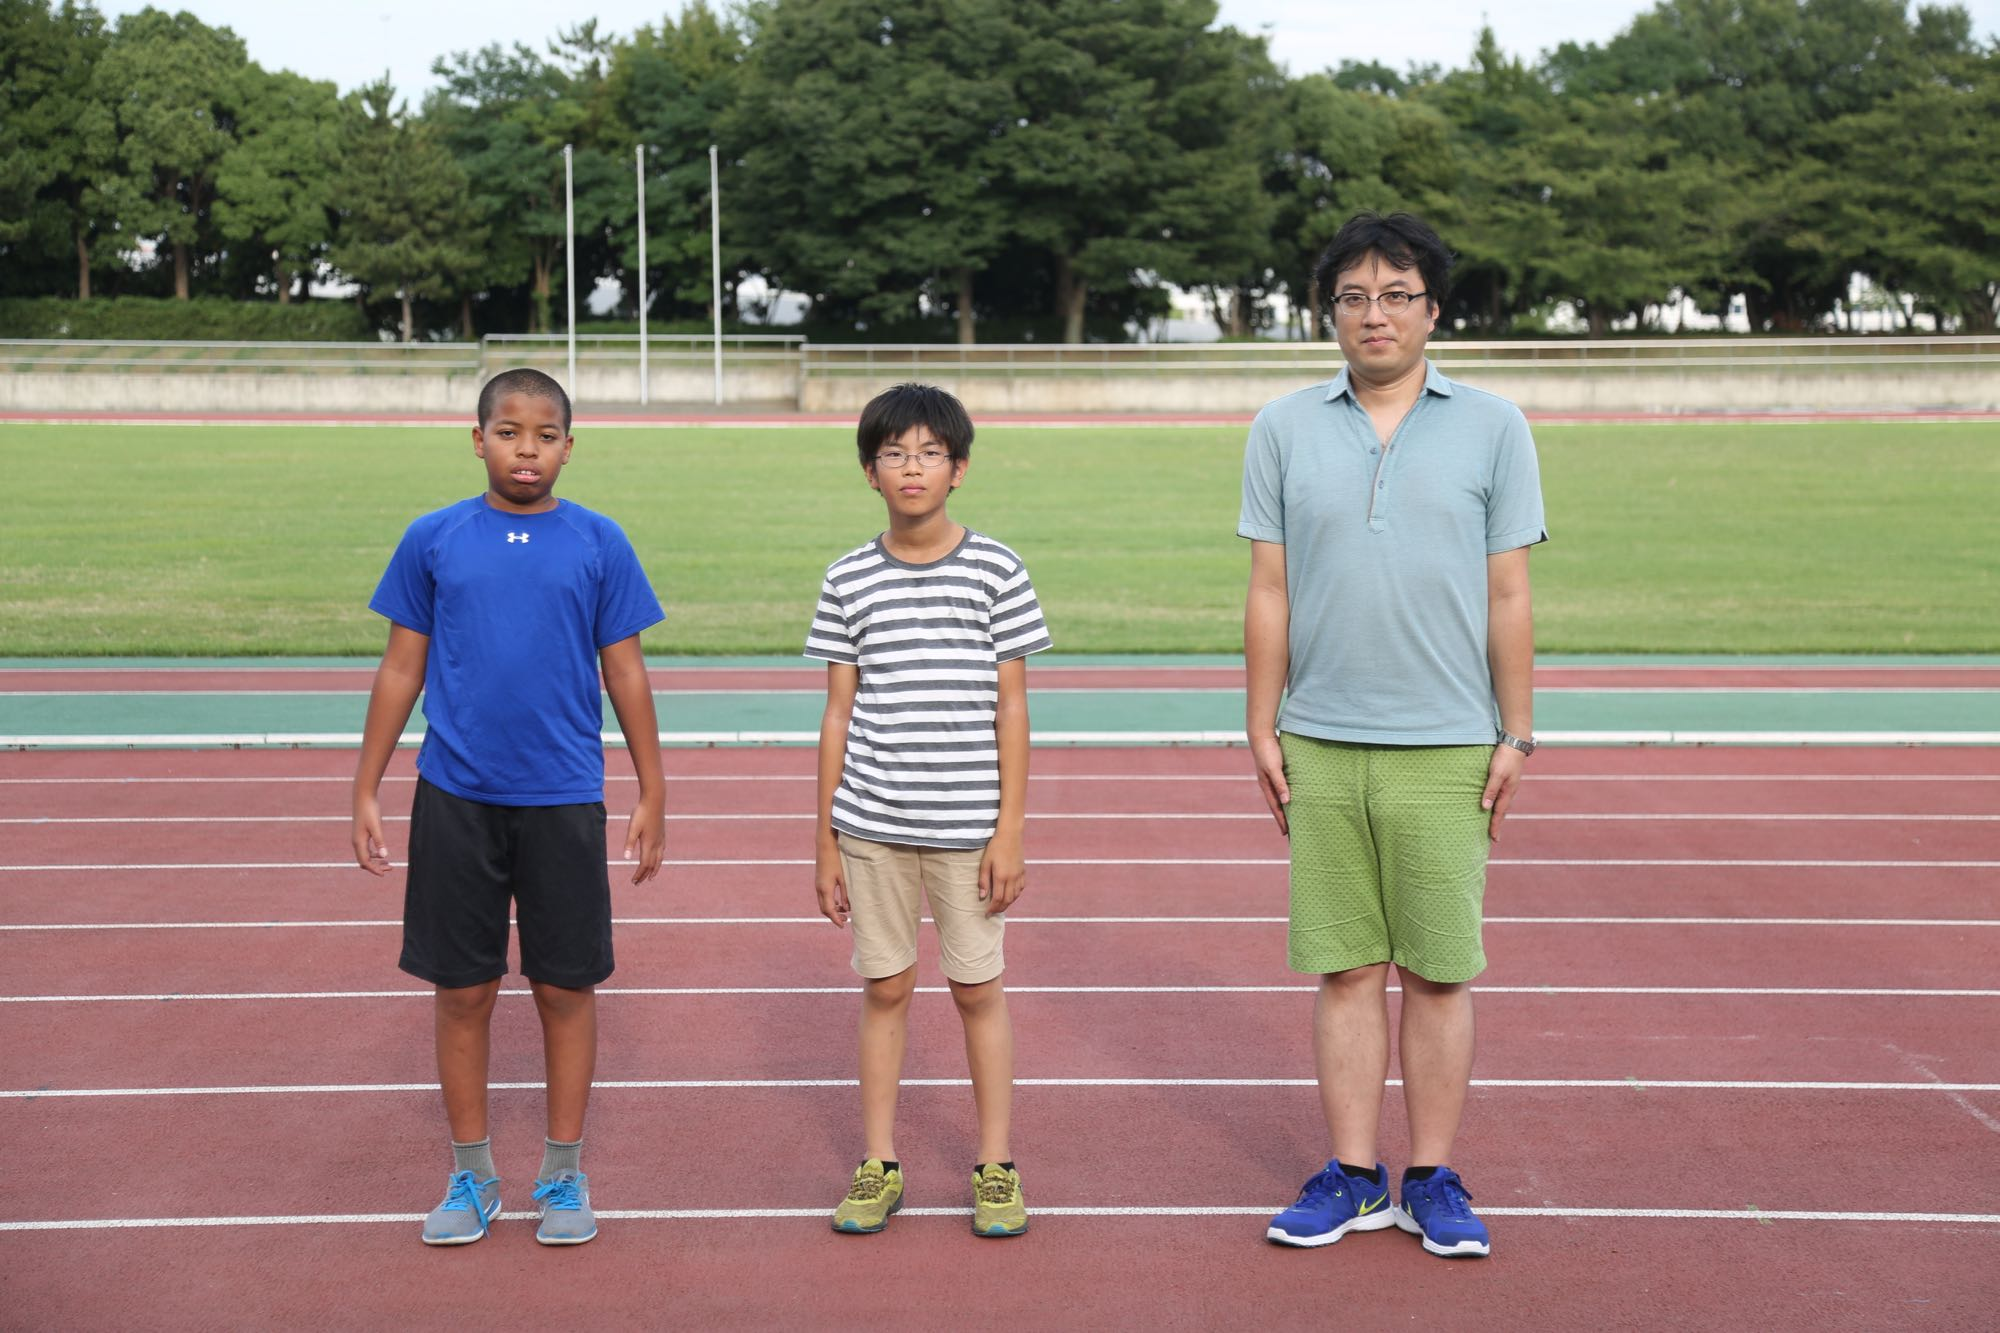 38ae7344a3d46 速く走りたい子供たちへ タイムが1秒縮むコツを専門家に聞いてみた ...